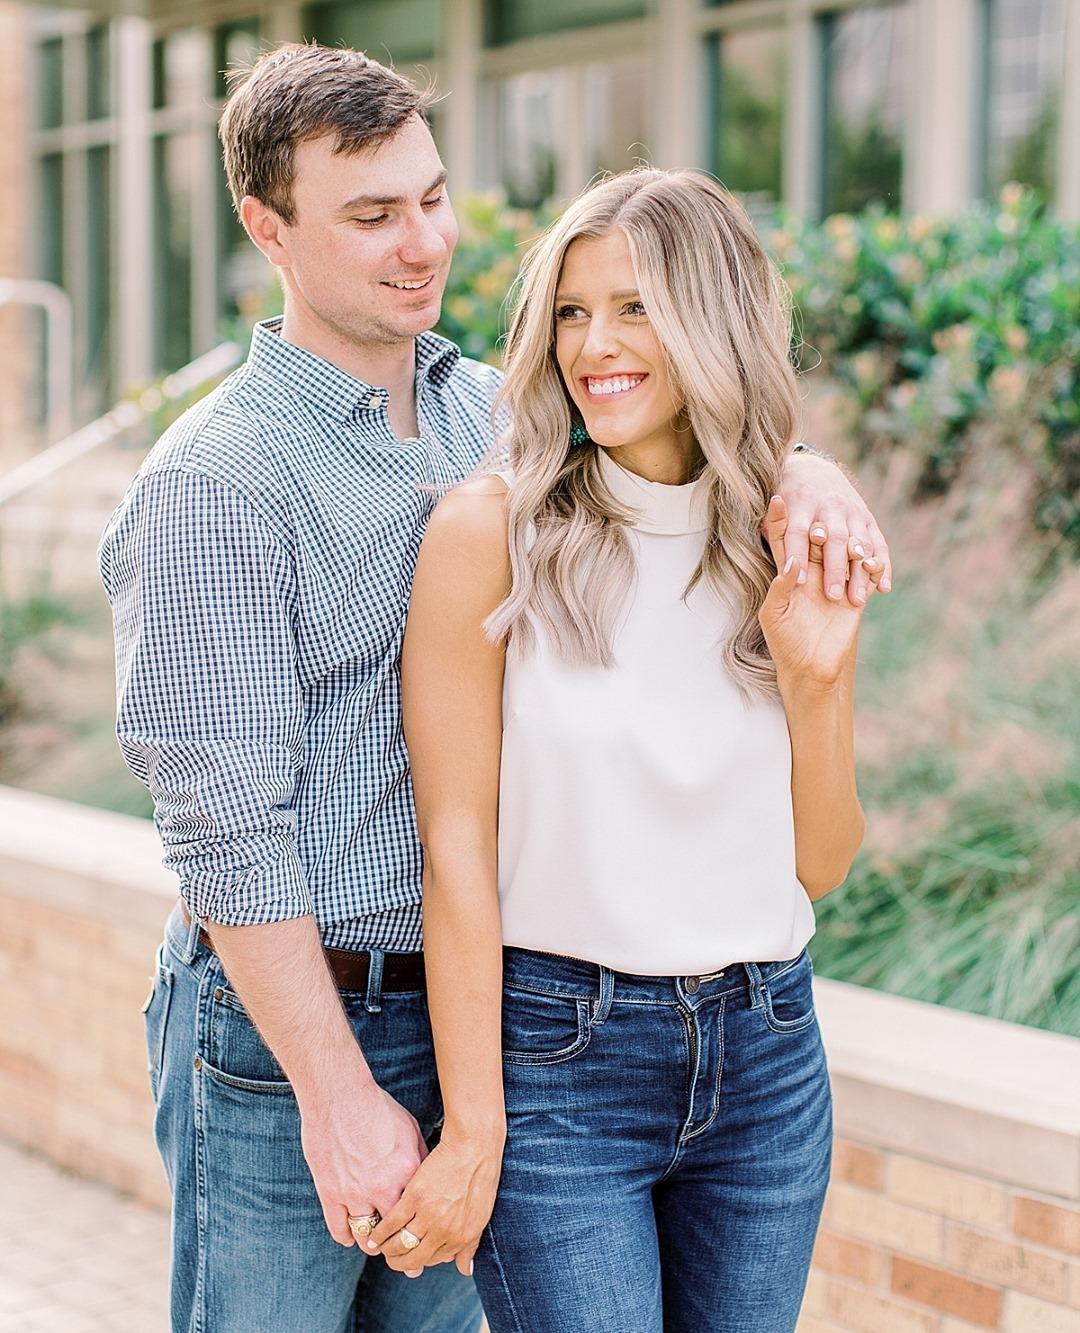 Celebrating Two Milestones: Getting Married During Graduation Season